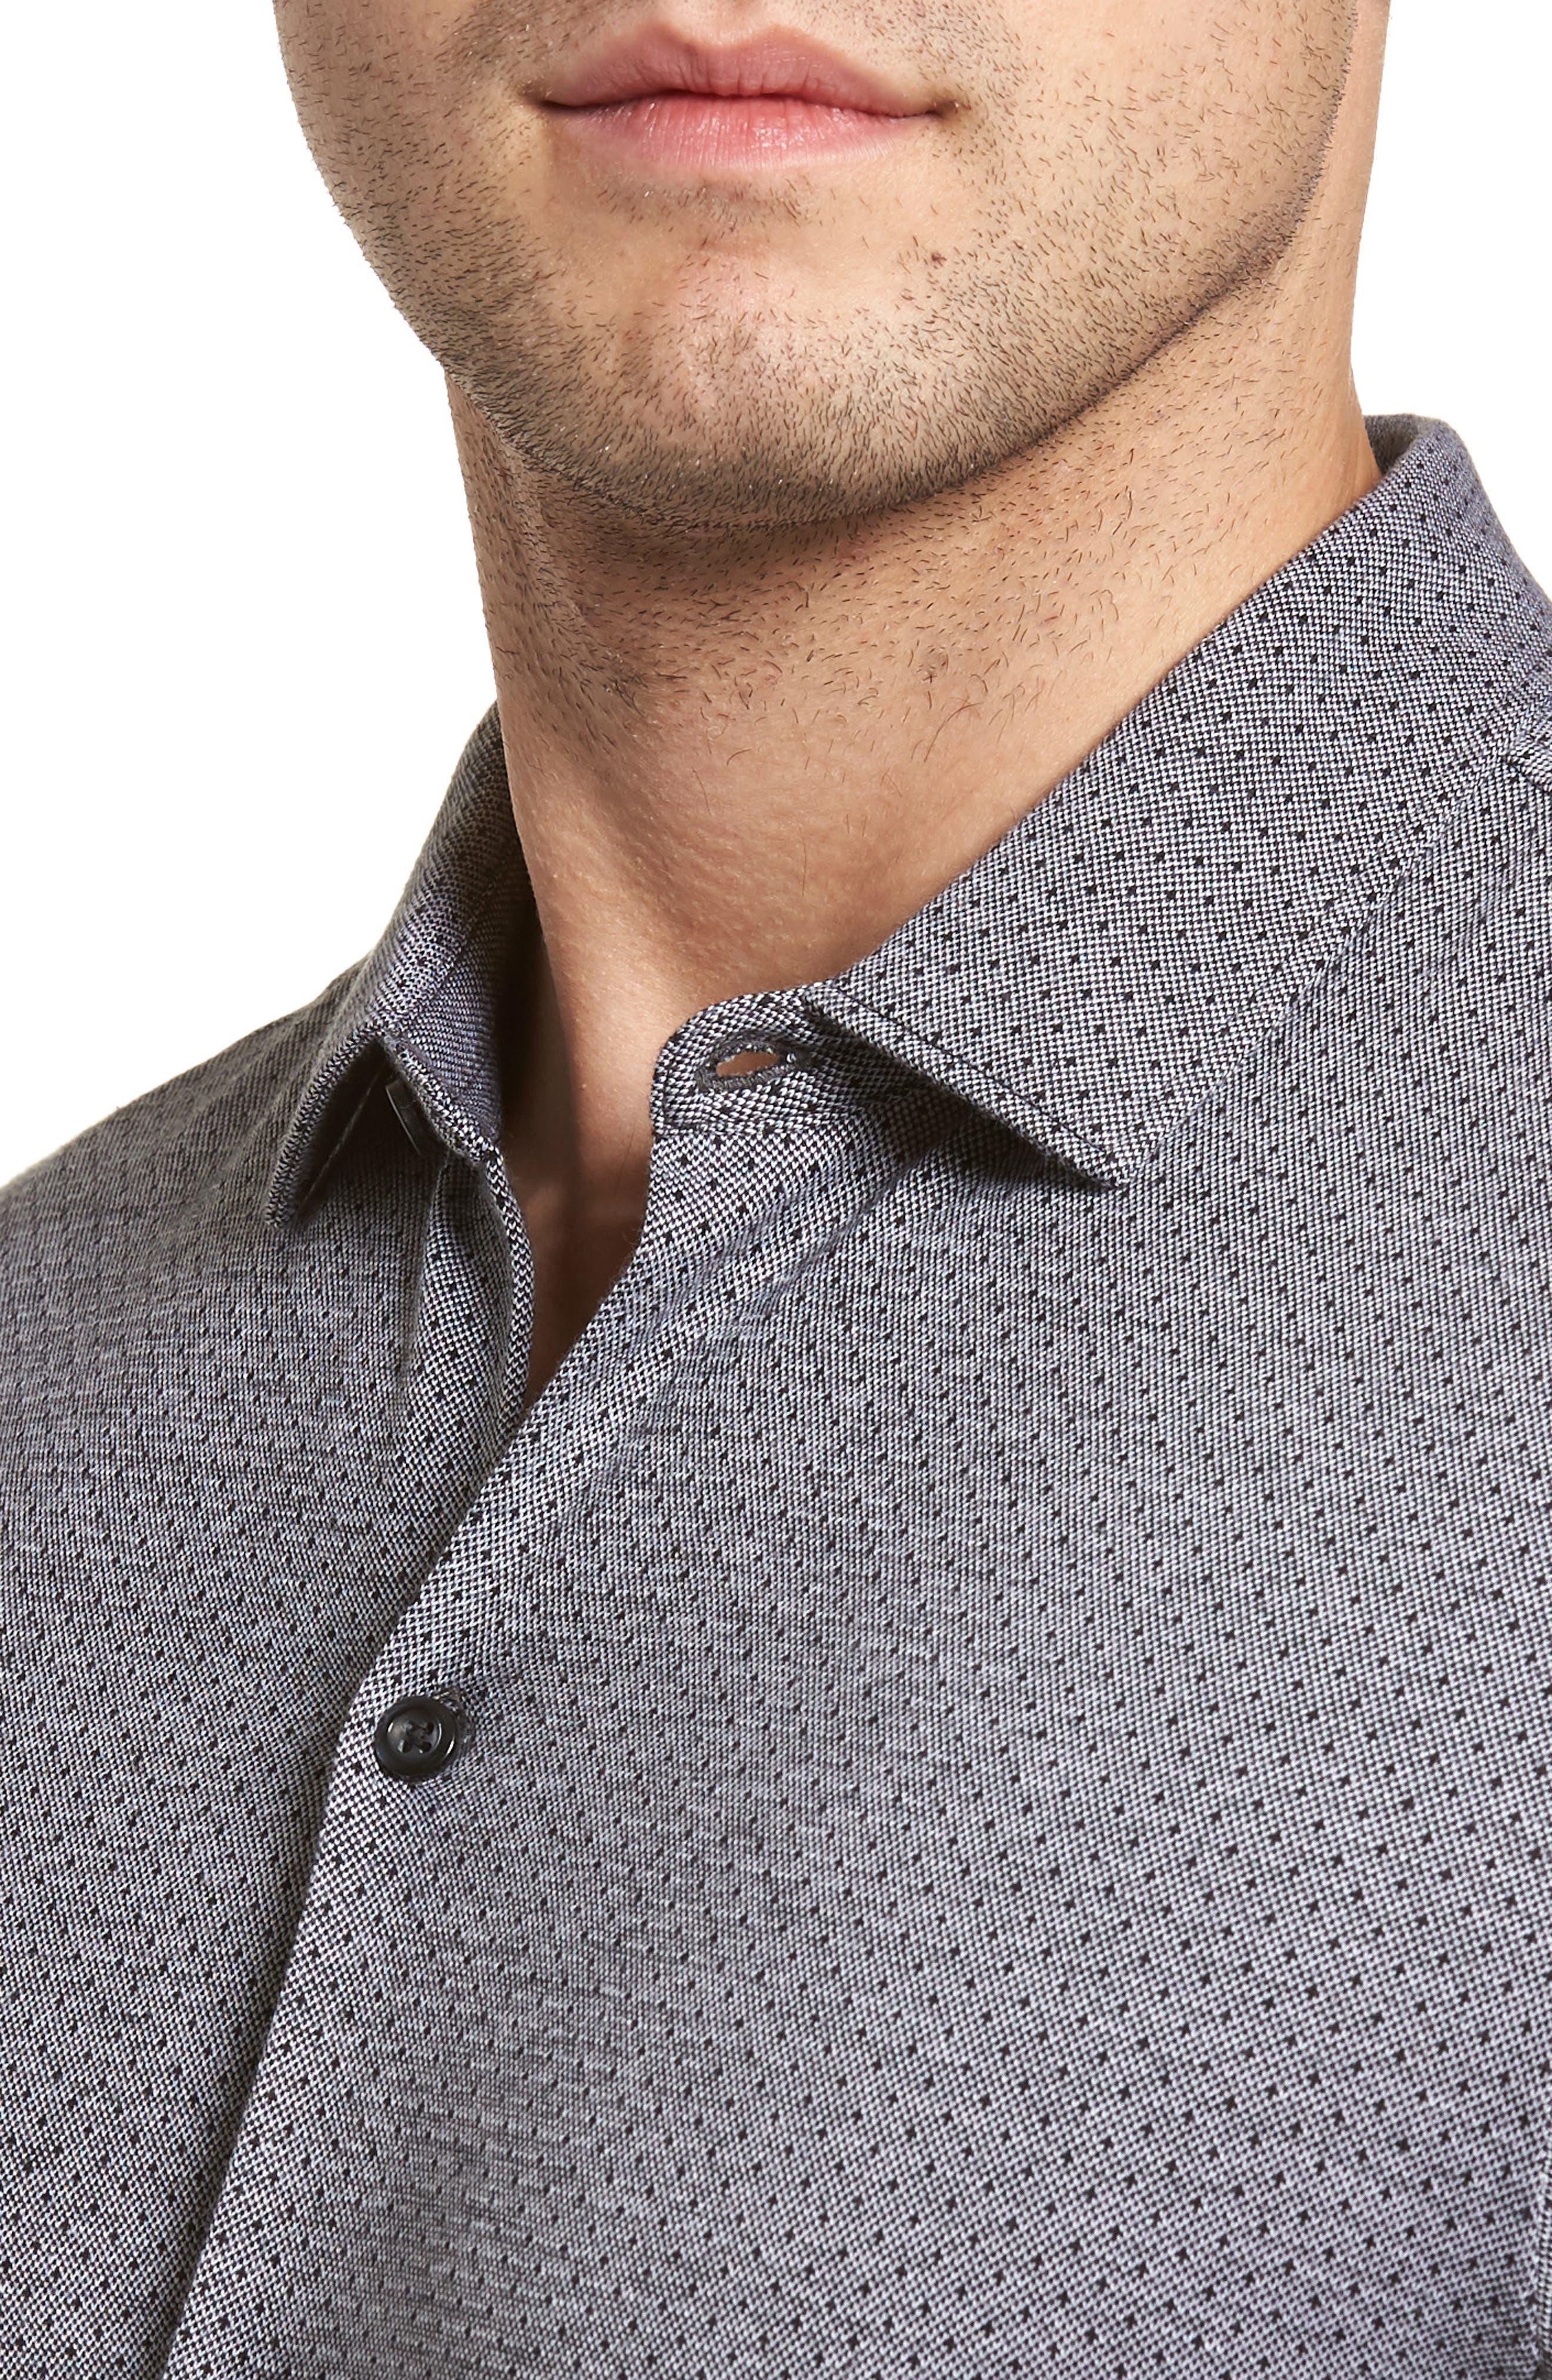 Johnson Sport Shirt,                             Alternate thumbnail 4, color,                             001